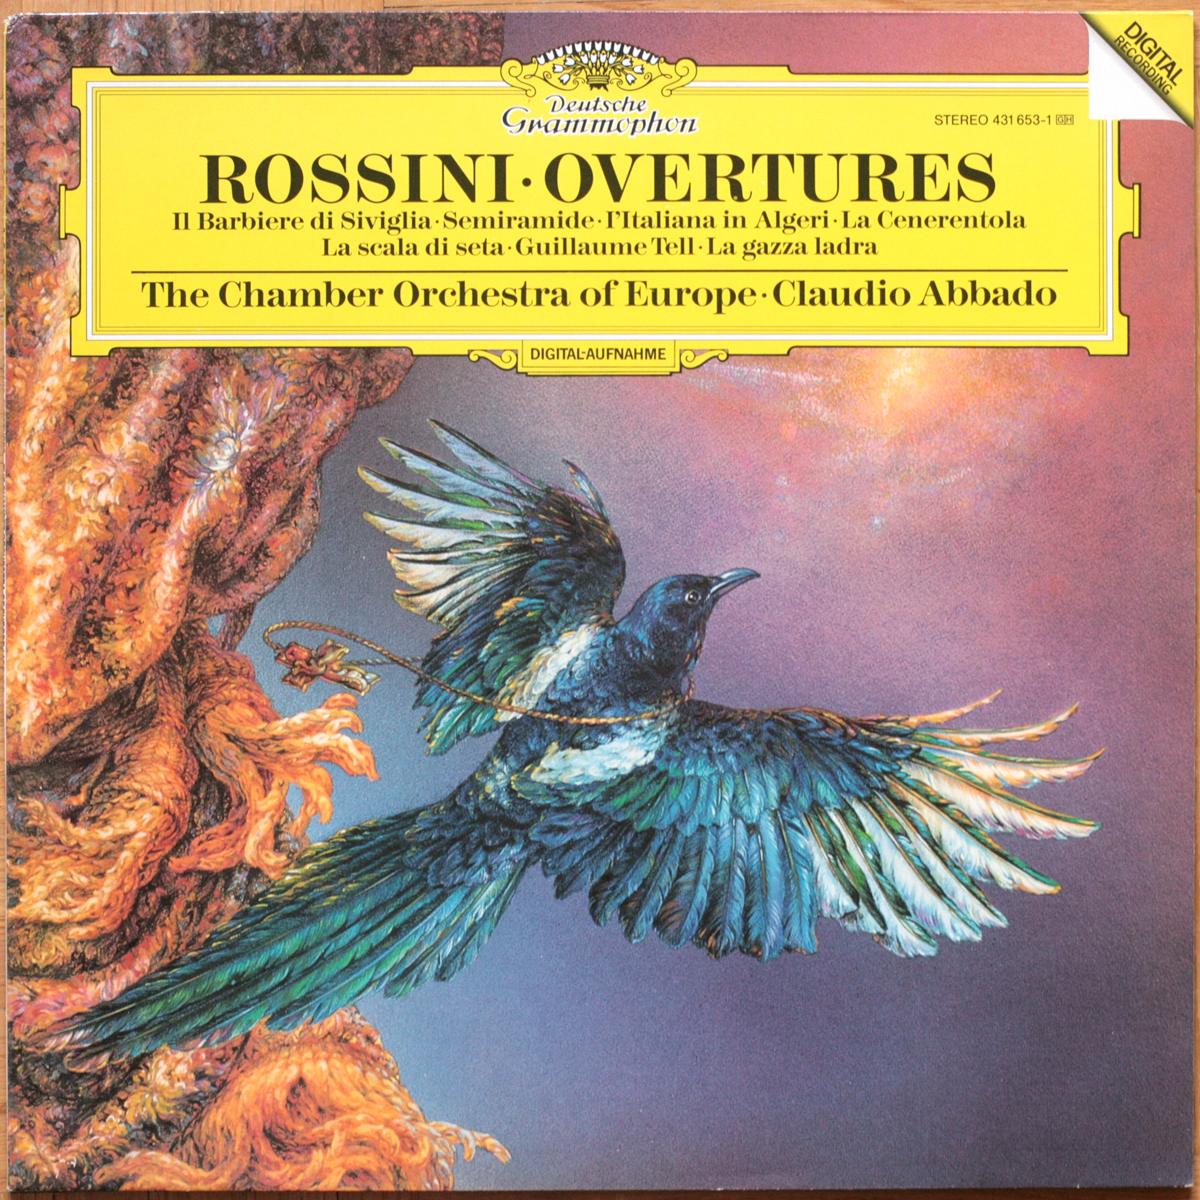 DGG 431 653 Rossini Ouvertures Abbado DGG Digital Aufnahme